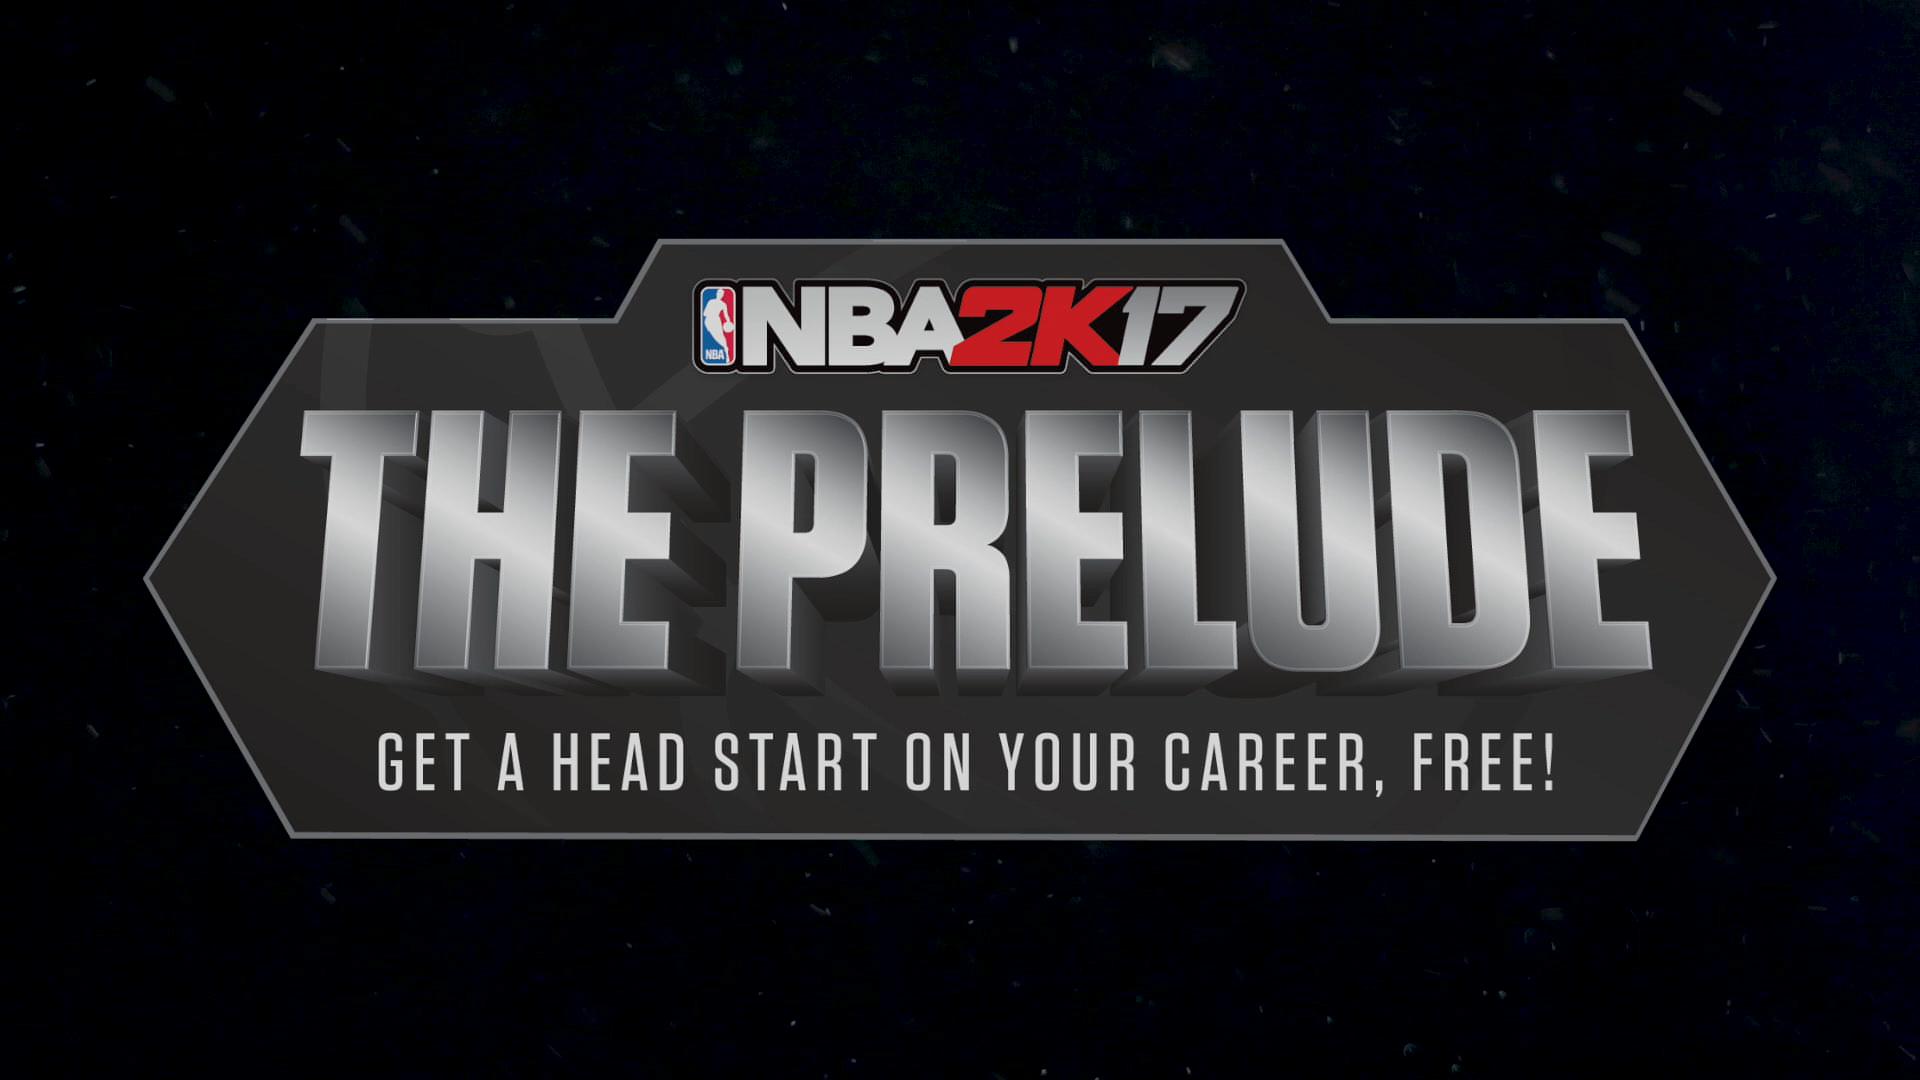 2K宣佈將自9月9日起,免費讓玩家下載《NBA 2K17》「序章」